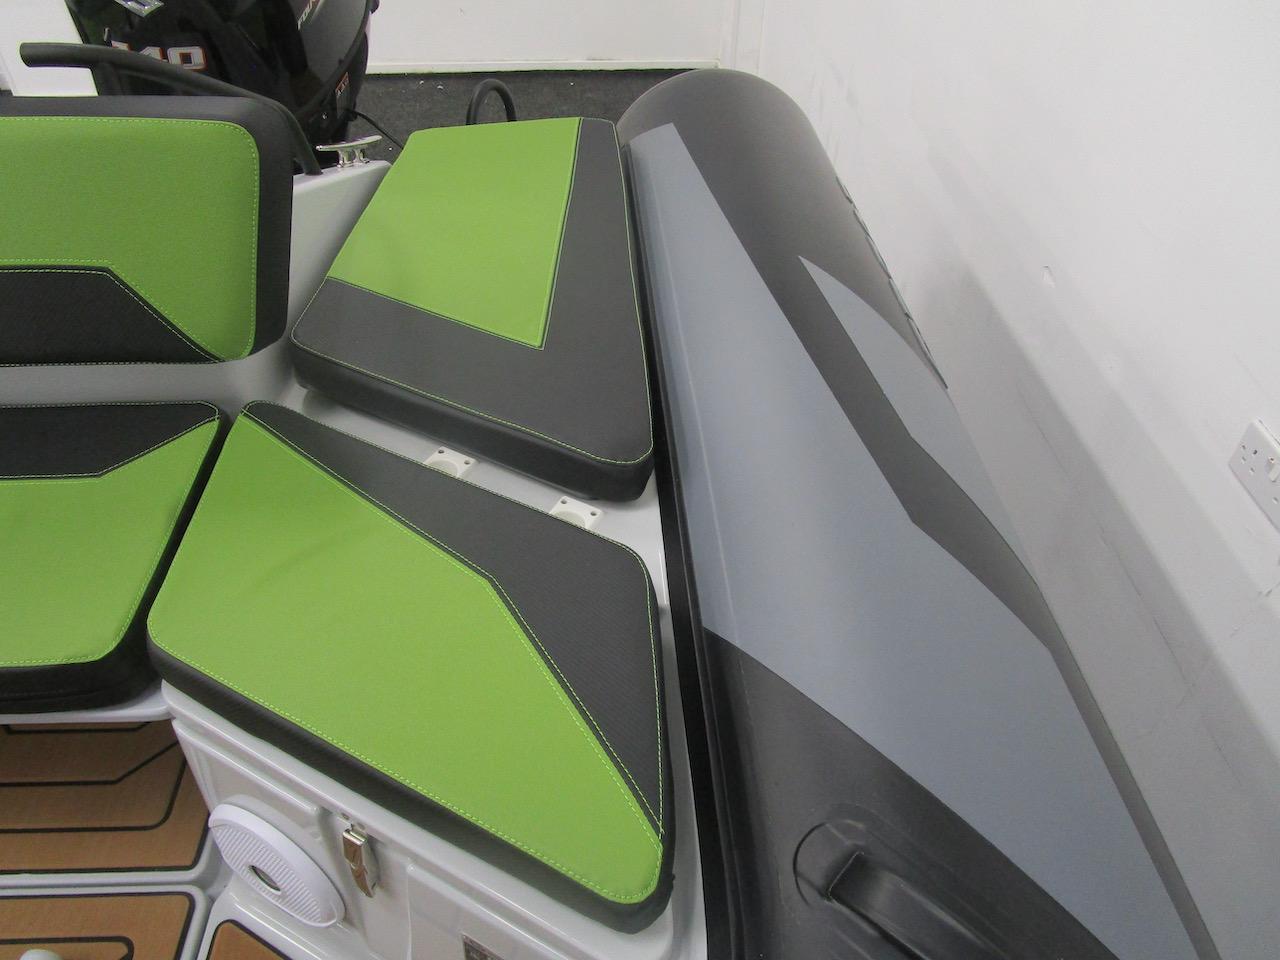 GRAND DRIVE D600 RIB rear seat with infill no cushions